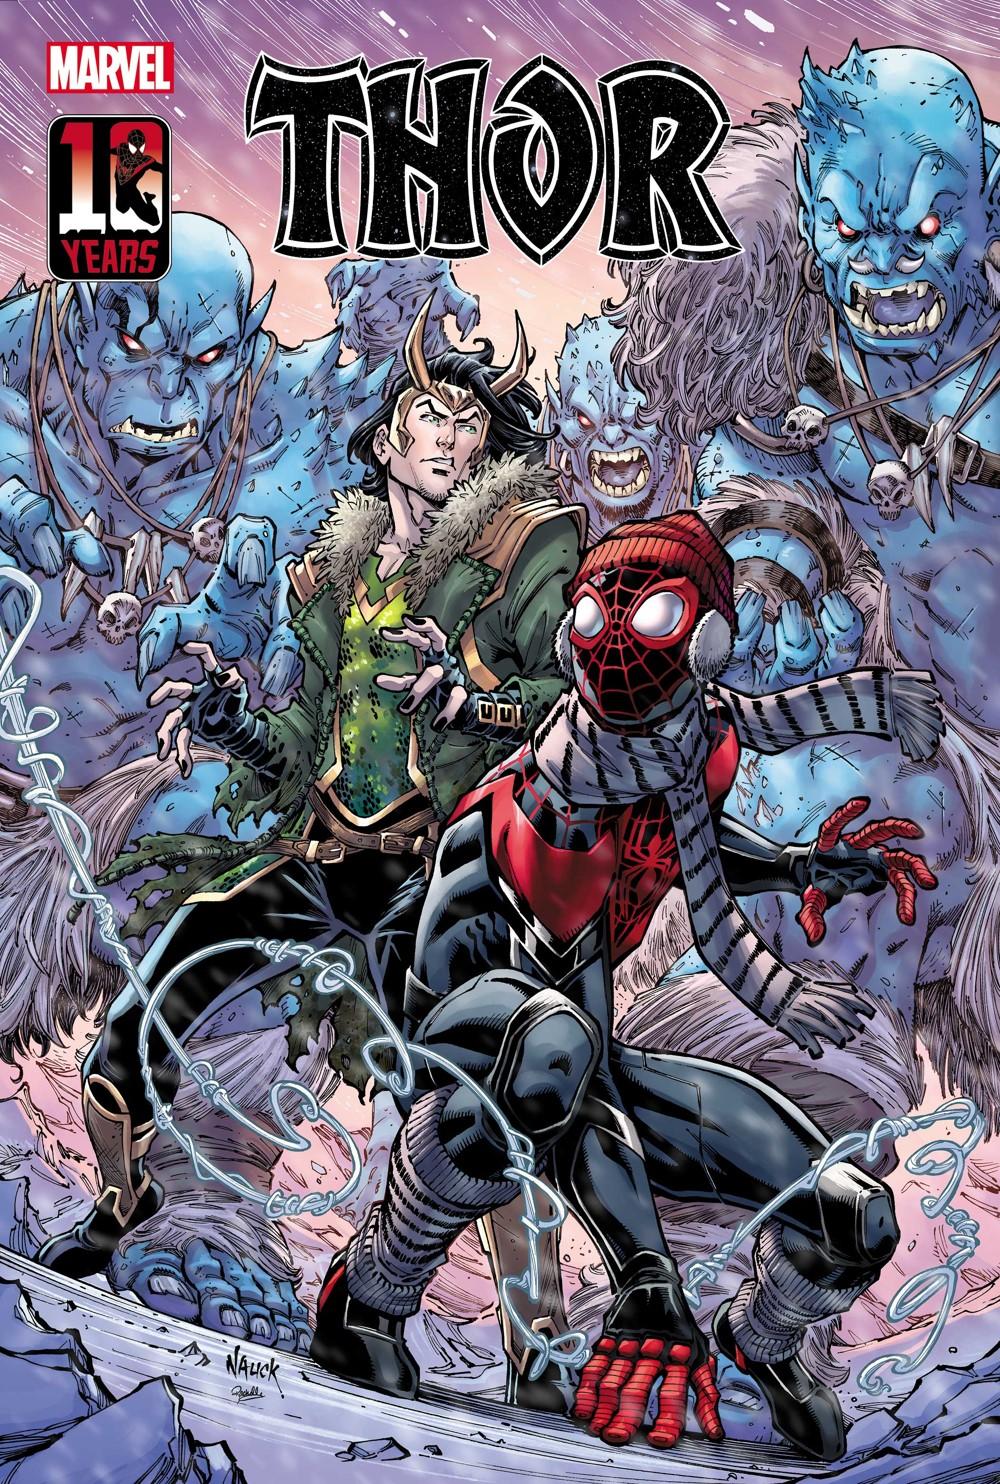 THOR2020017_Nauck_Miles_var Marvel Comics September 2021 Solicitations